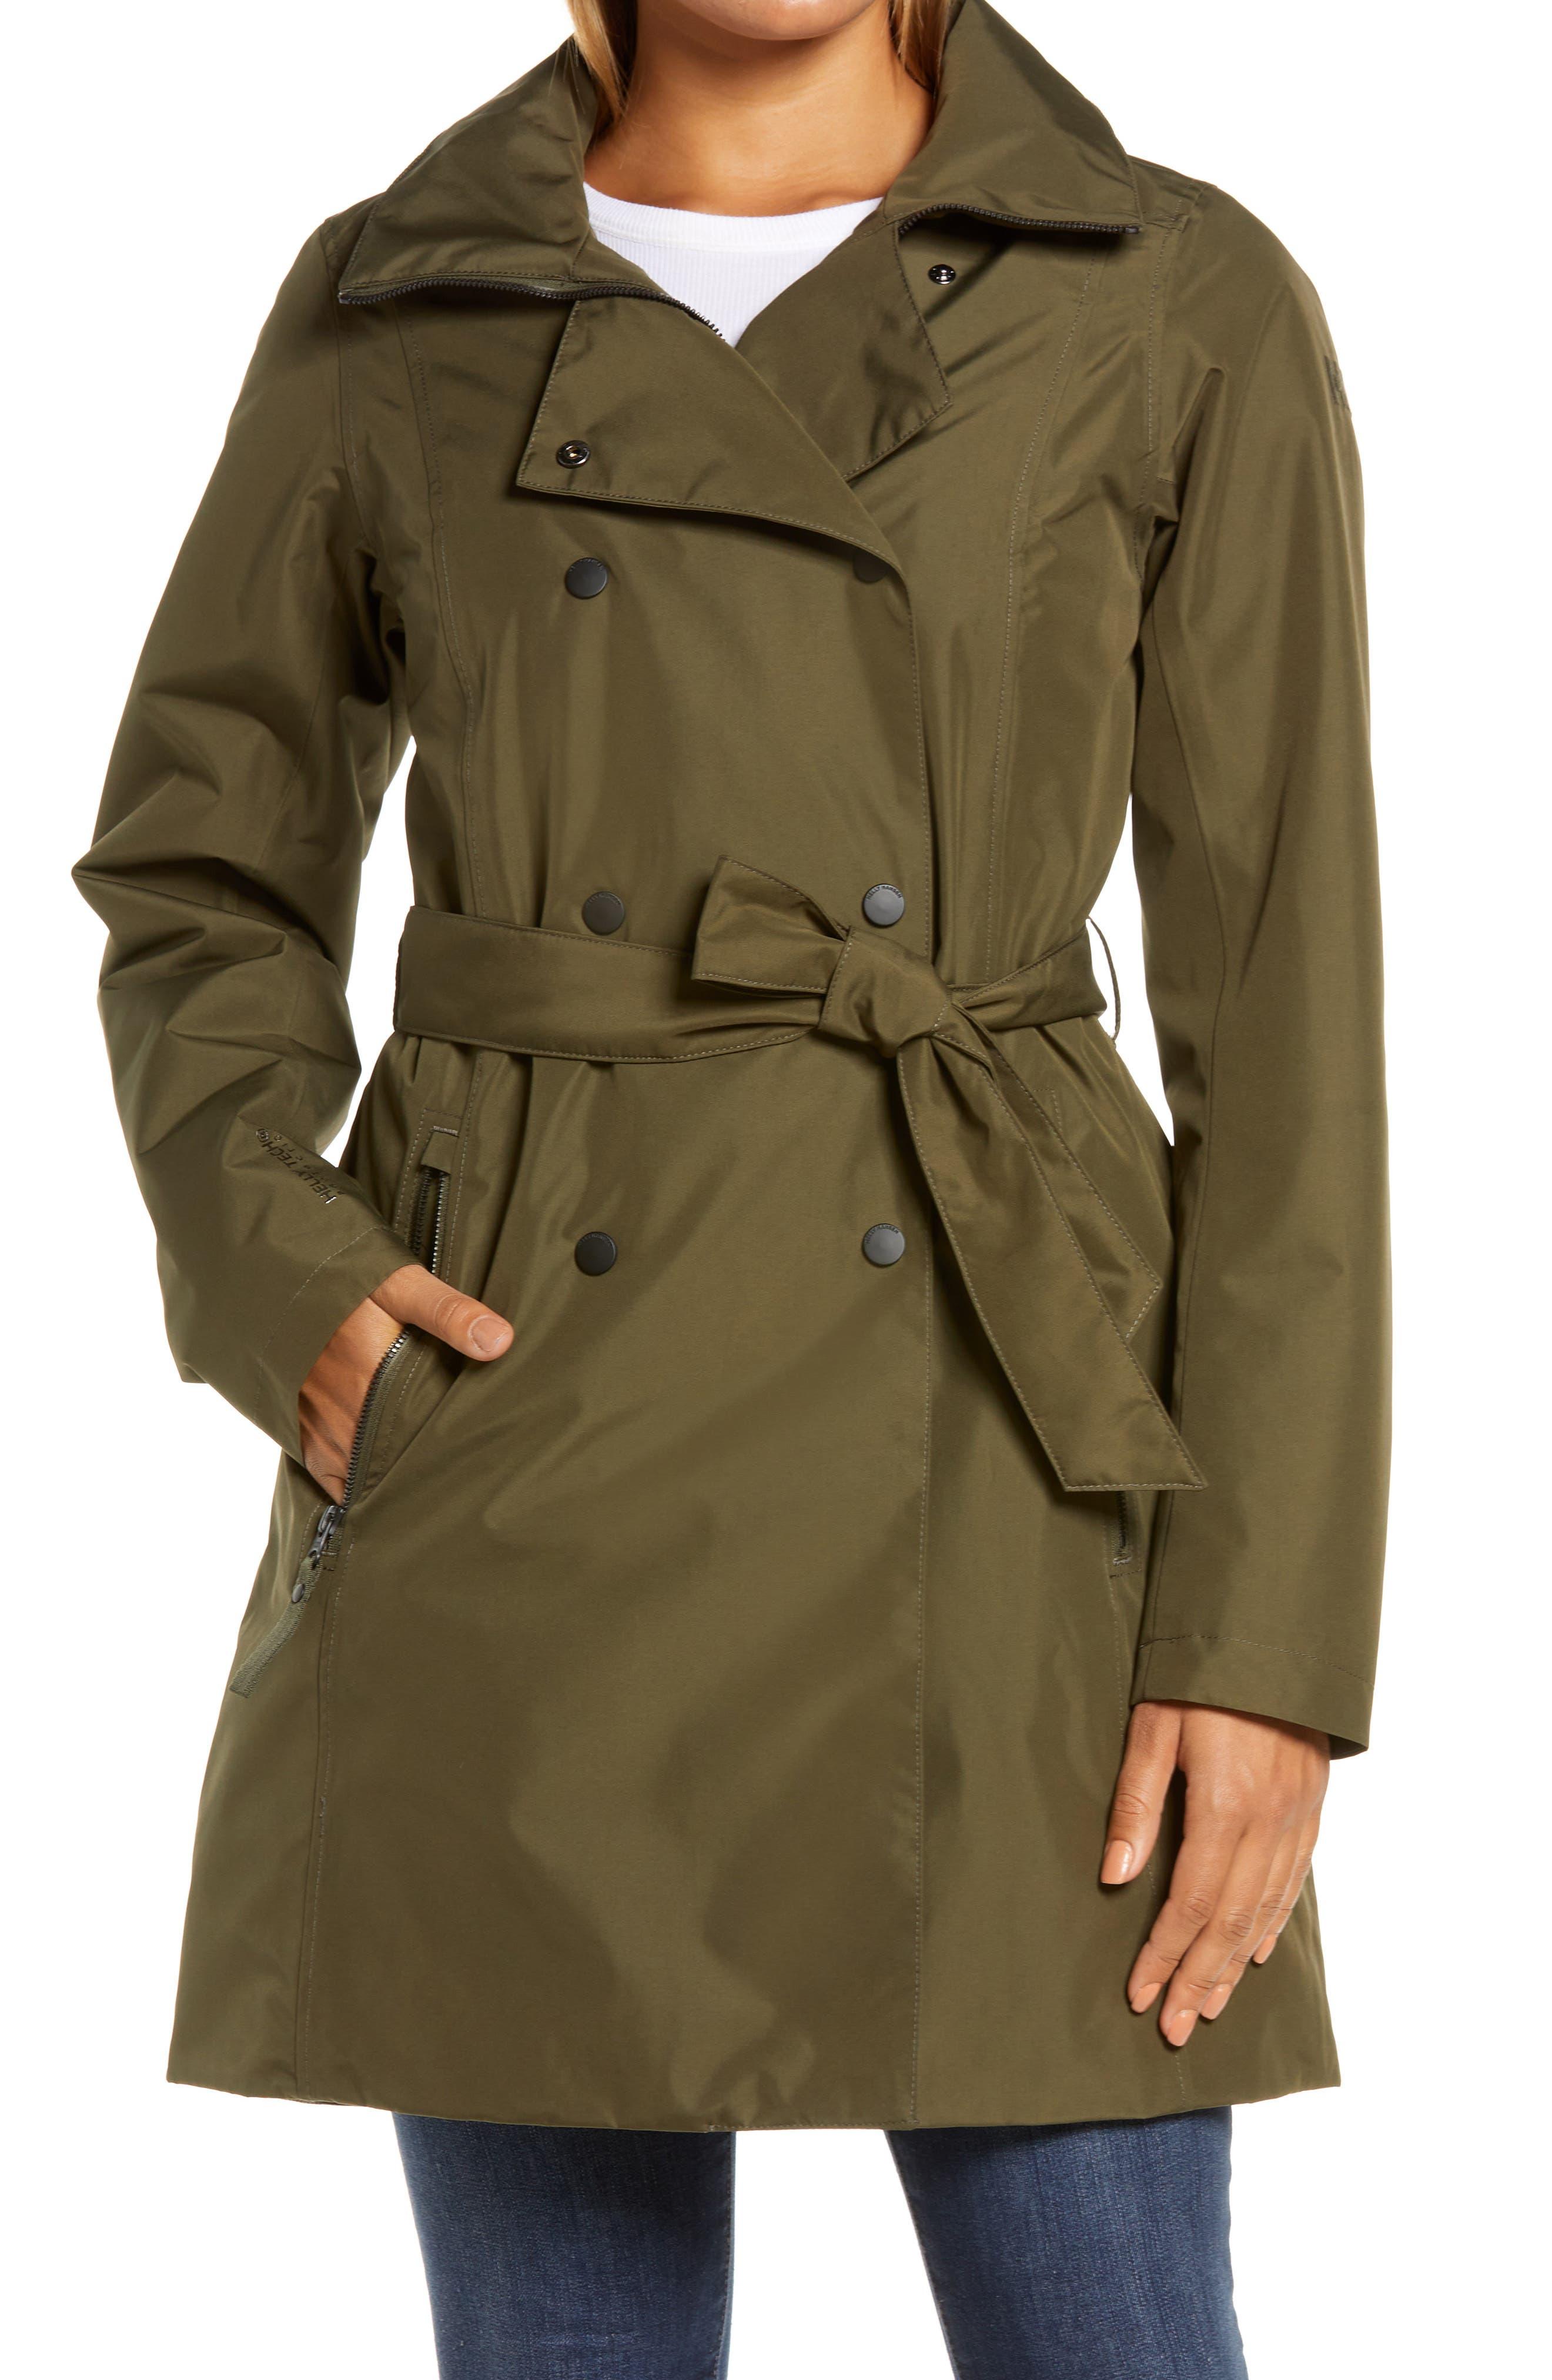 Welsey Ii Insulated Waterproof Trench Coat